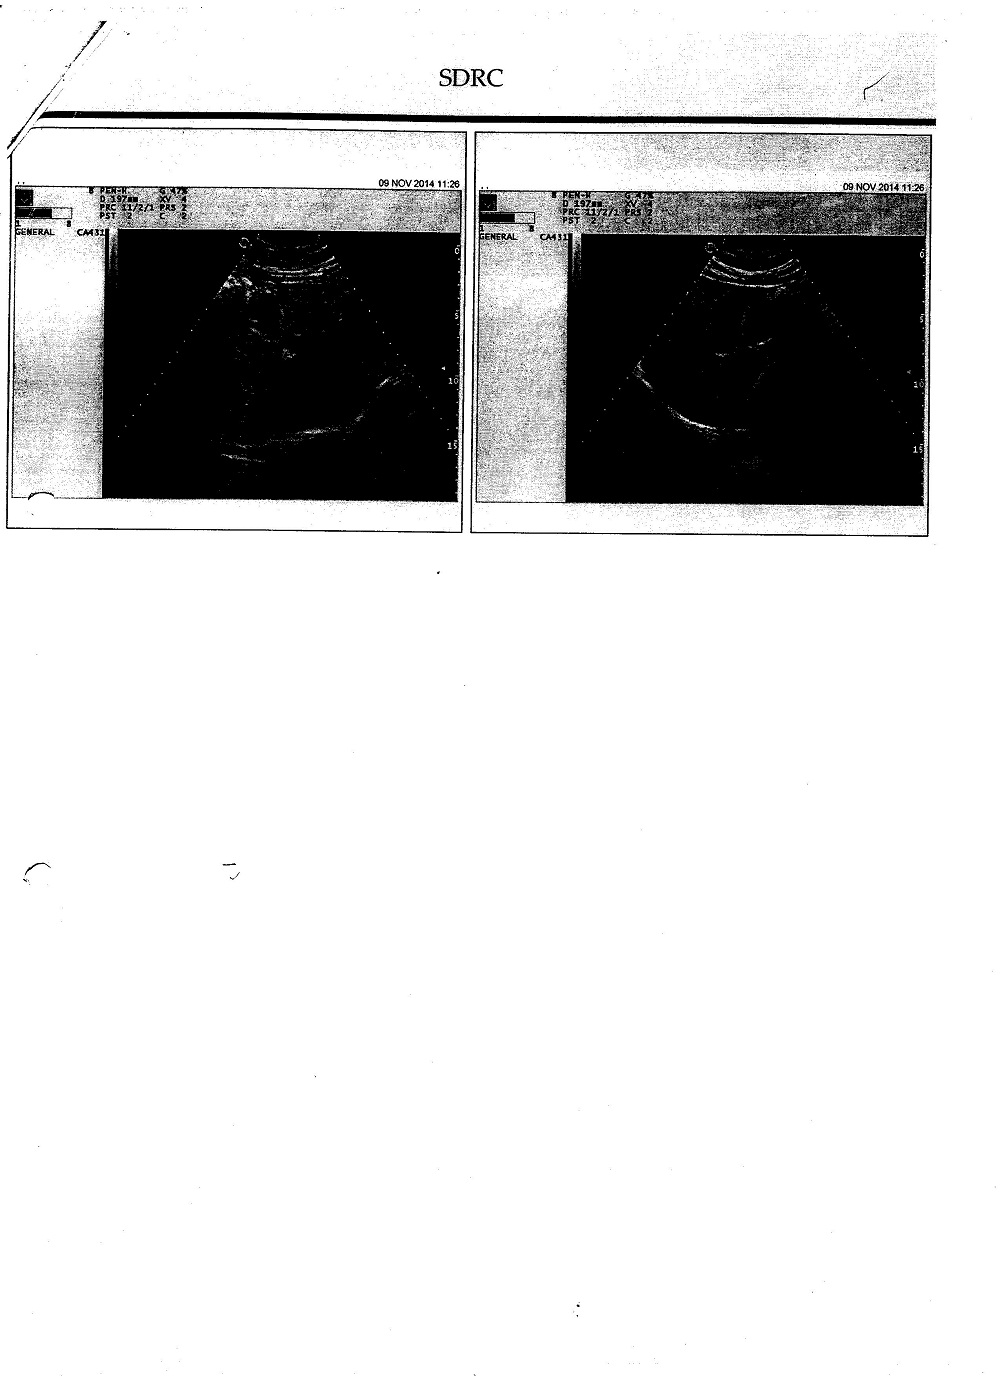 v-ramchandra-left-kidney-small-in-size-echozenecity-increased-cmd-lost-2